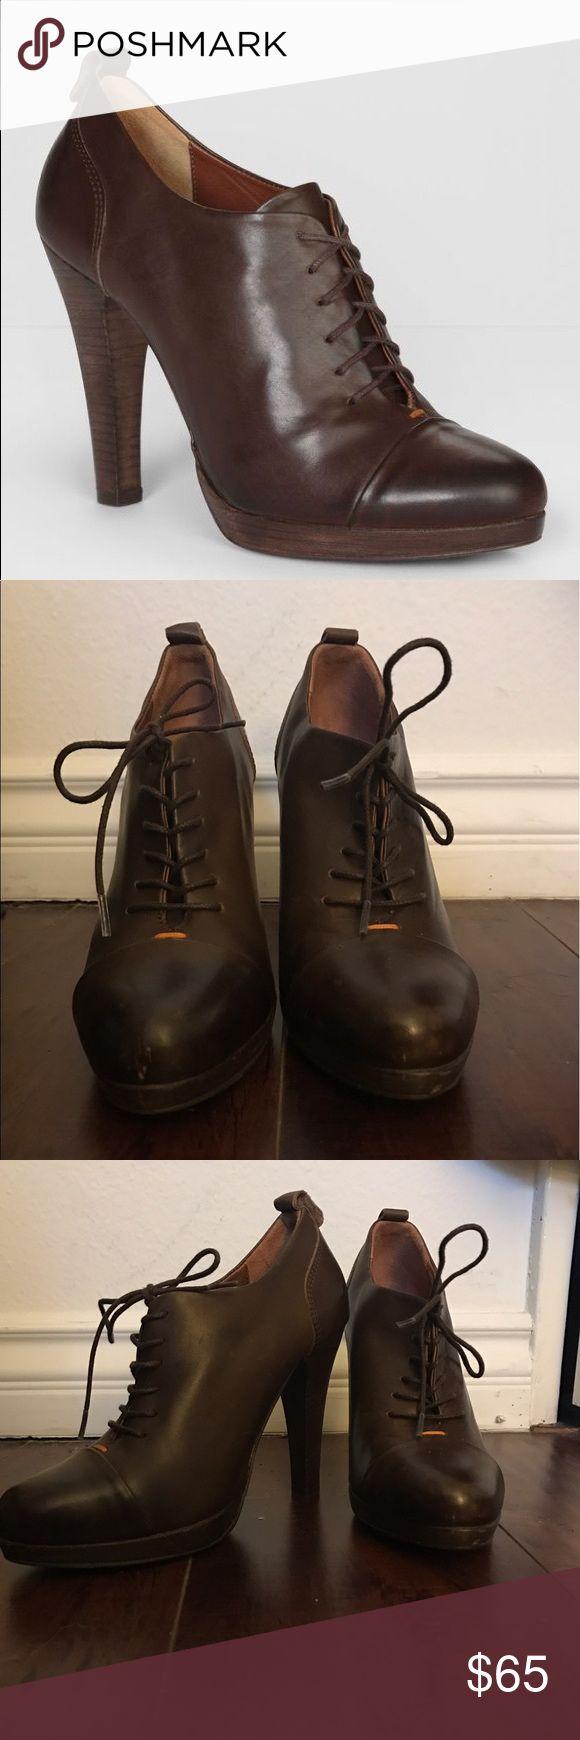 best 25+ oxford heels ideas on pinterest | oxford shoes heels